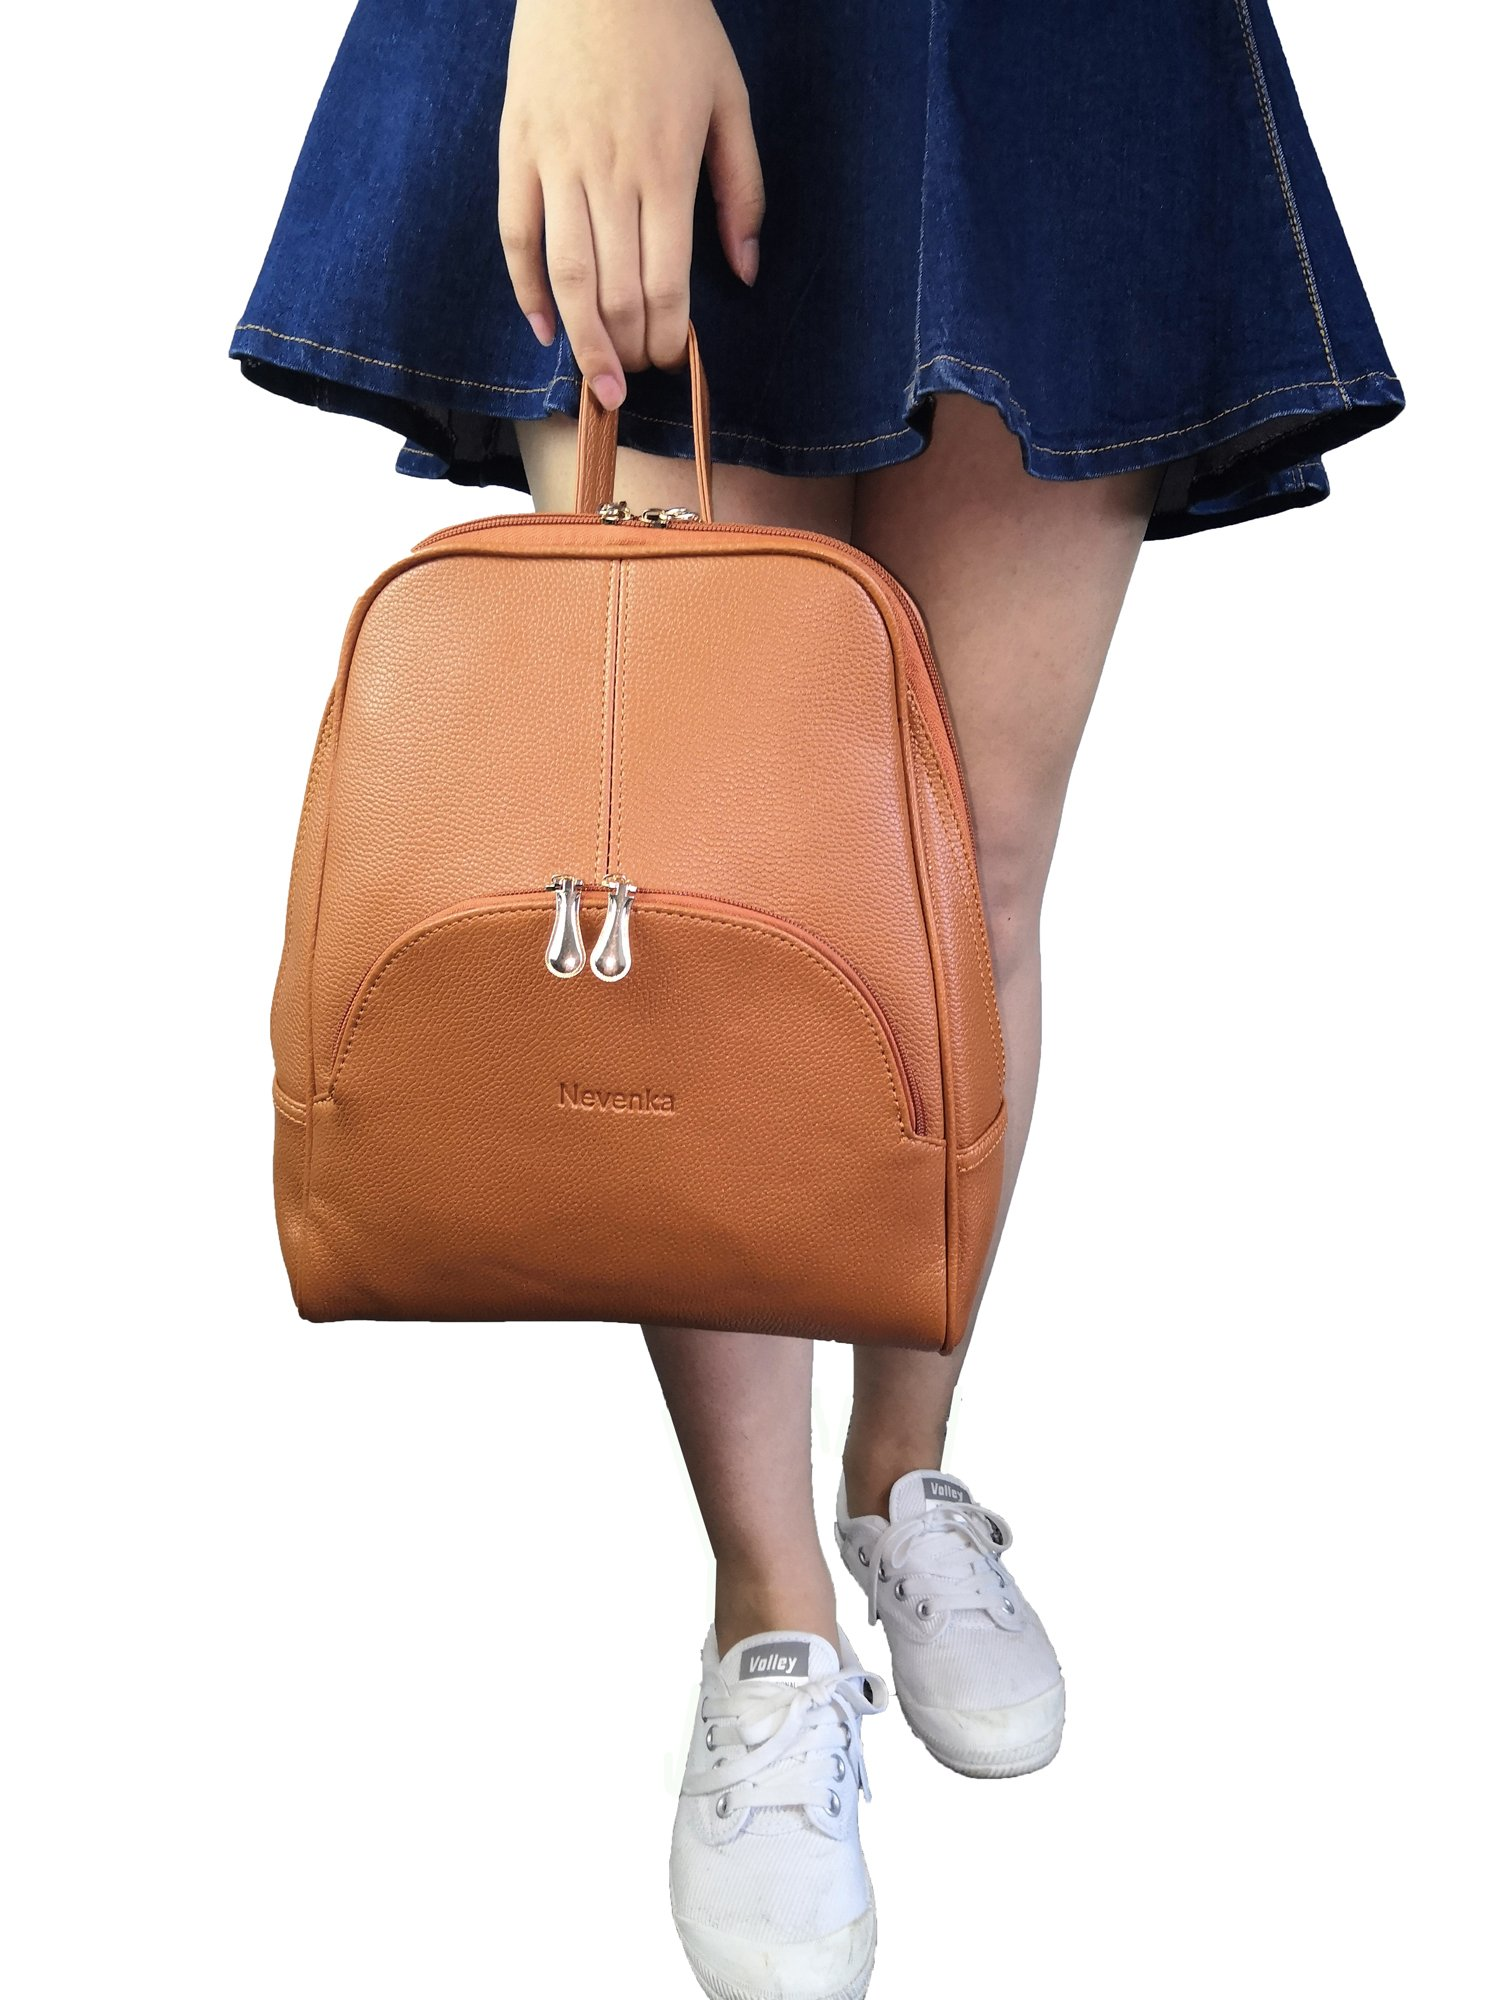 Nevenka Brand Women Bags Backpack Purse PU Leather Zipper Bags Casual Backpacks Shoulder Bags (Autumn Maple) by Nevenka (Image #6)